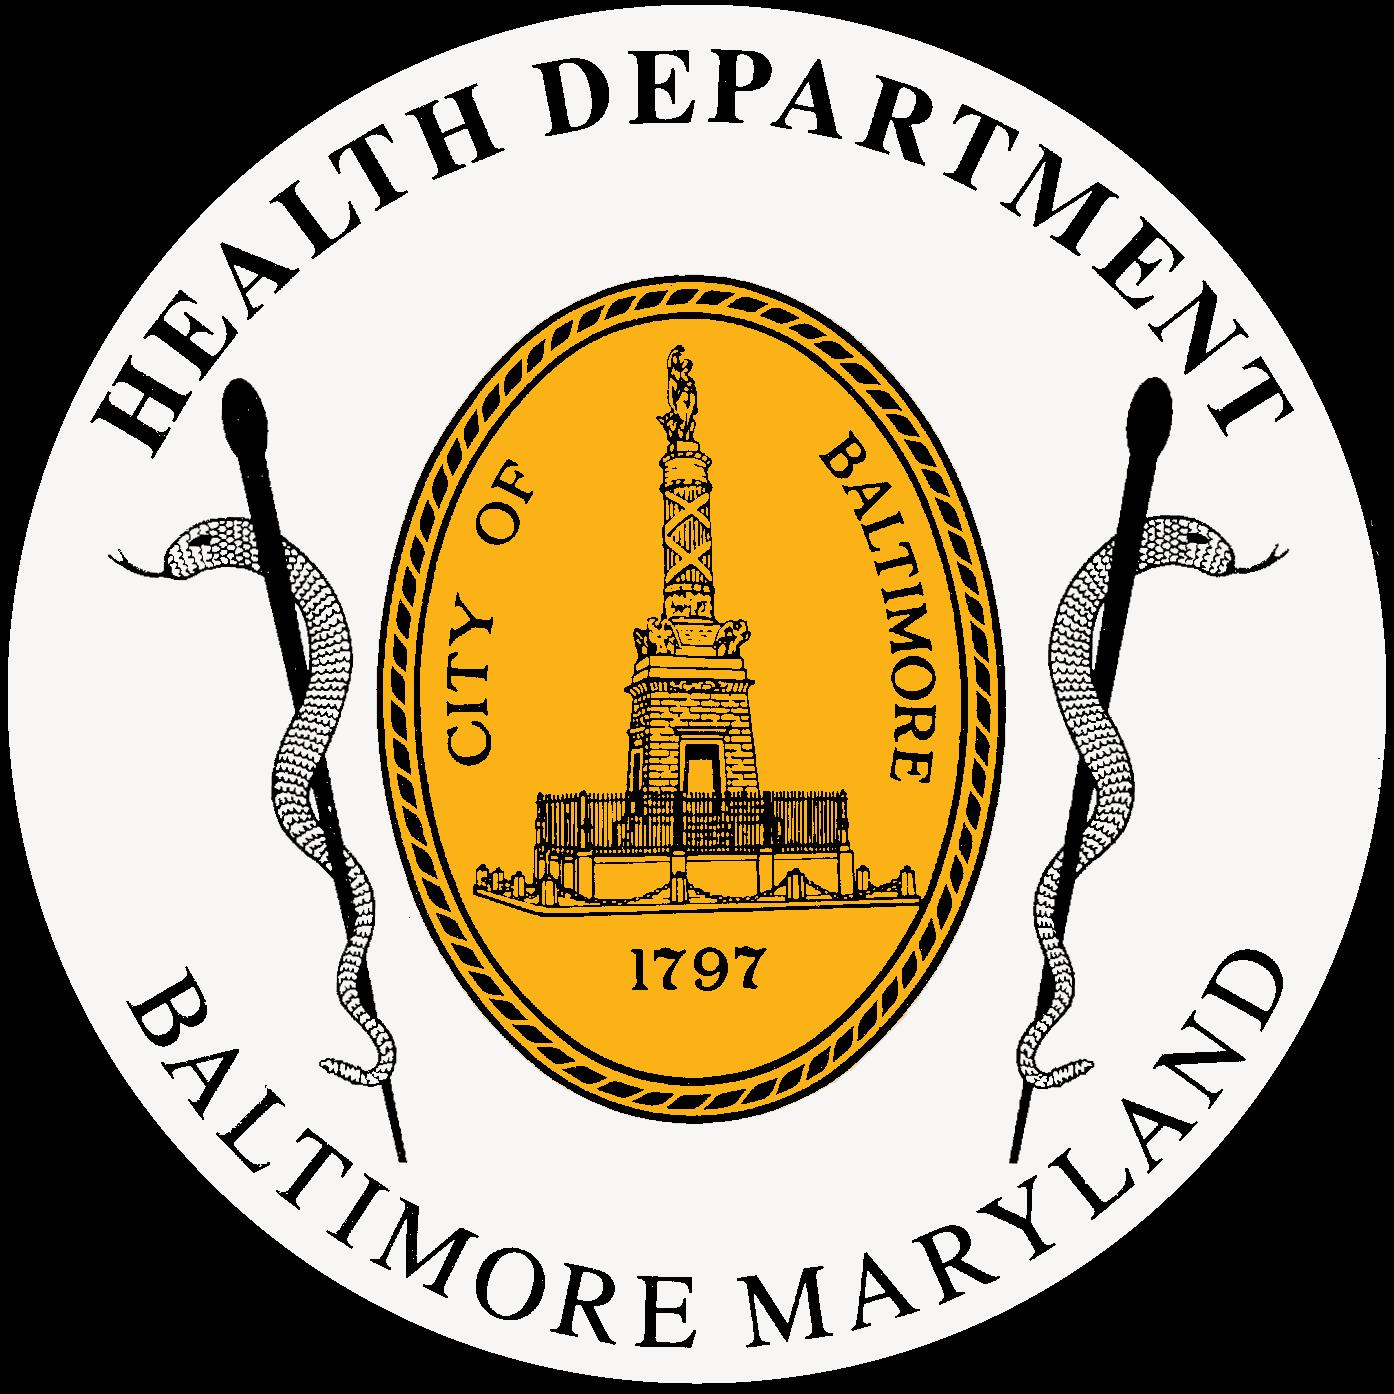 cdc health department